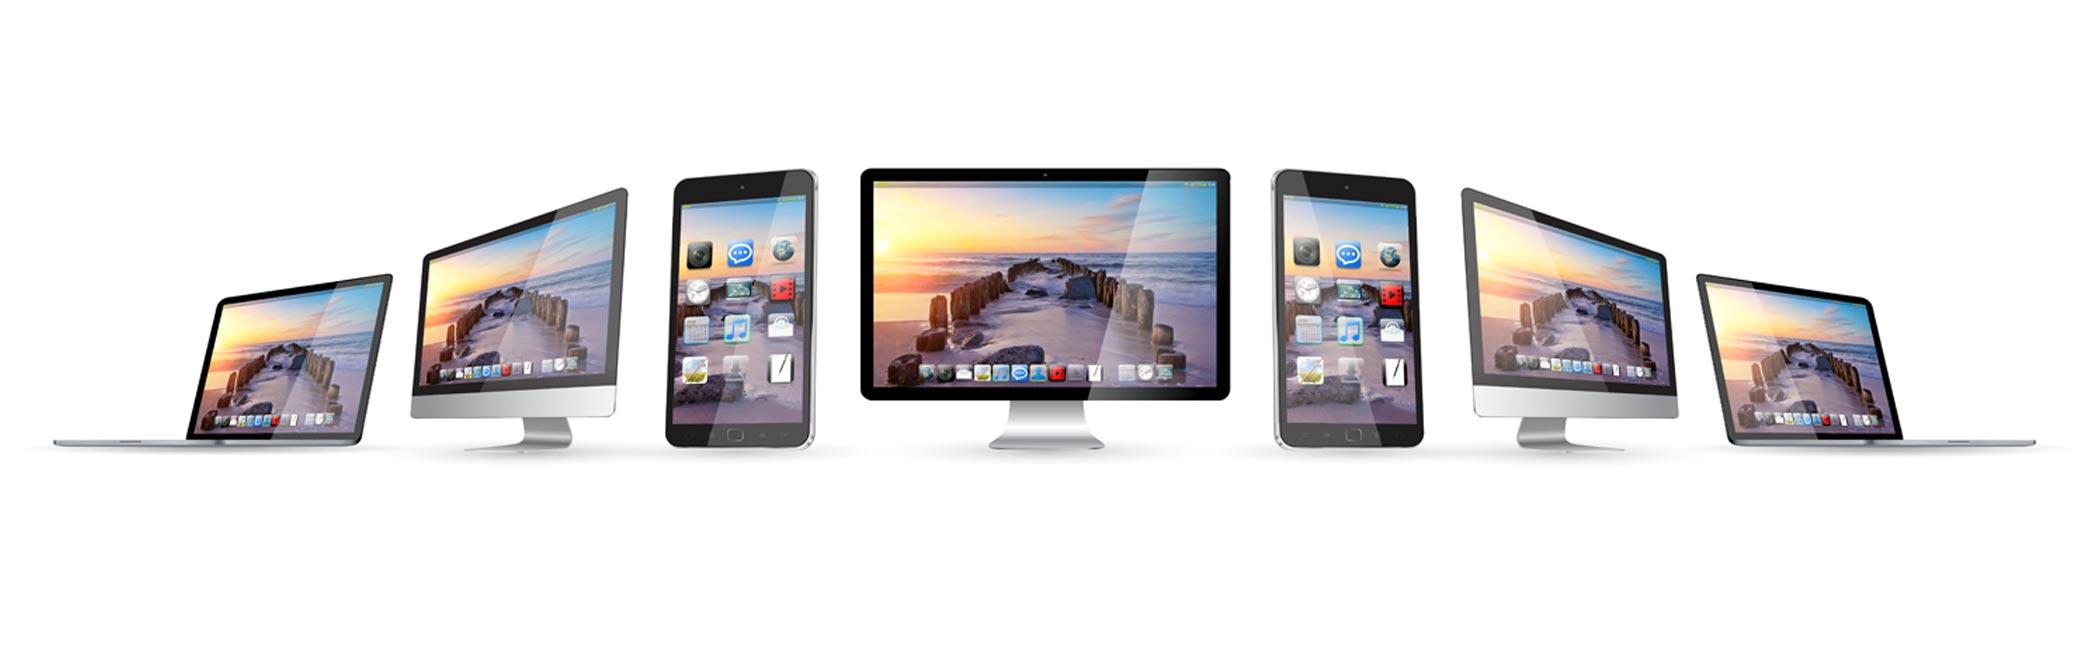 slide-3-monitors-2100x650